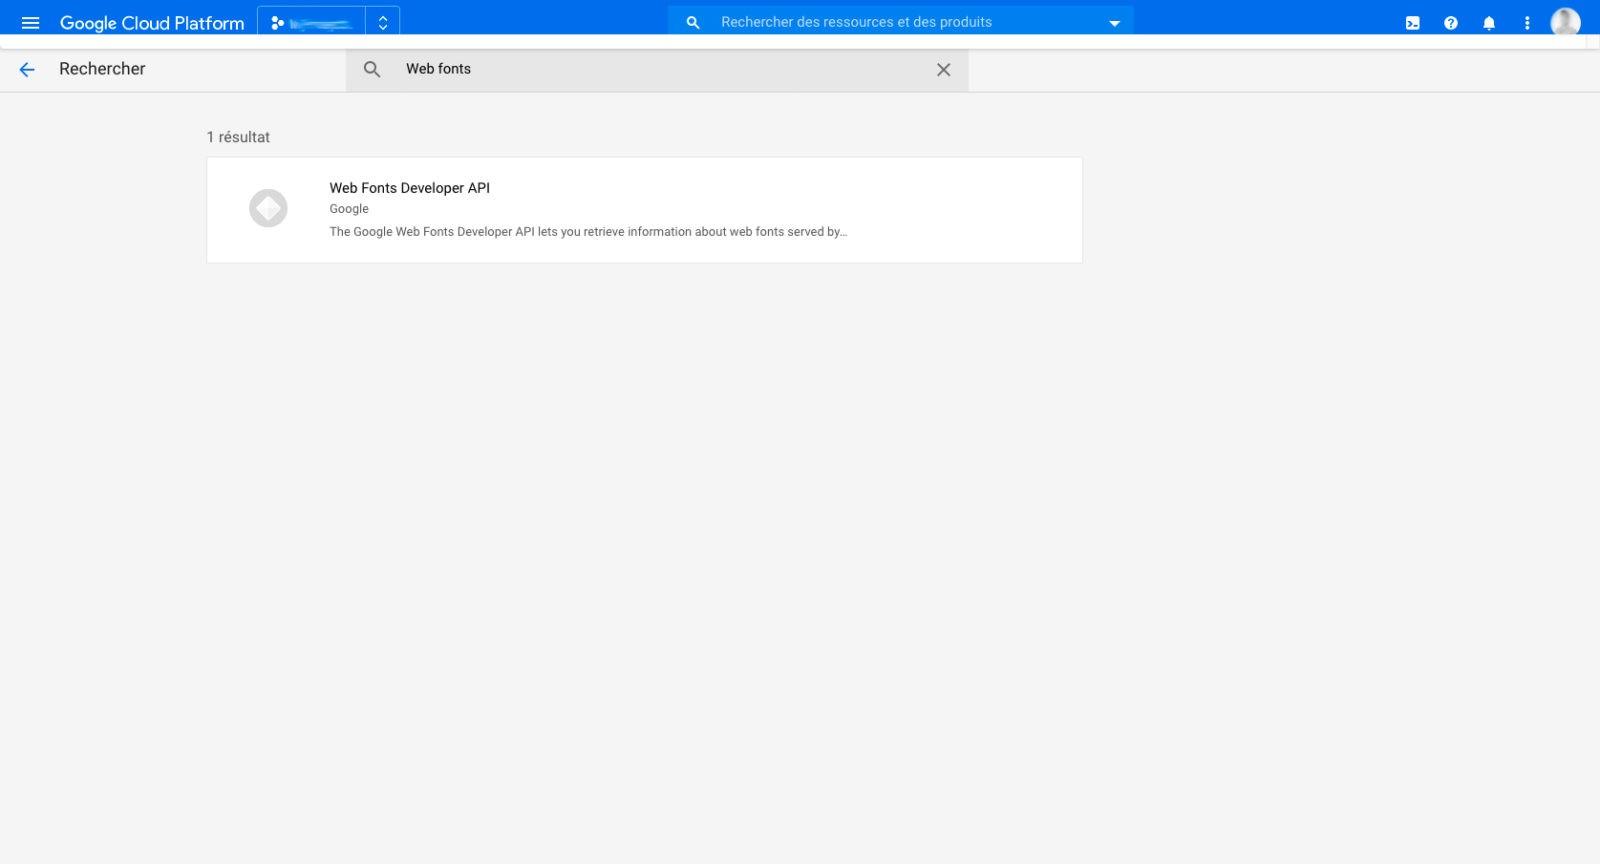 Rechercher Webfonts dans la bibliothèque d'API Google Cloud Platform